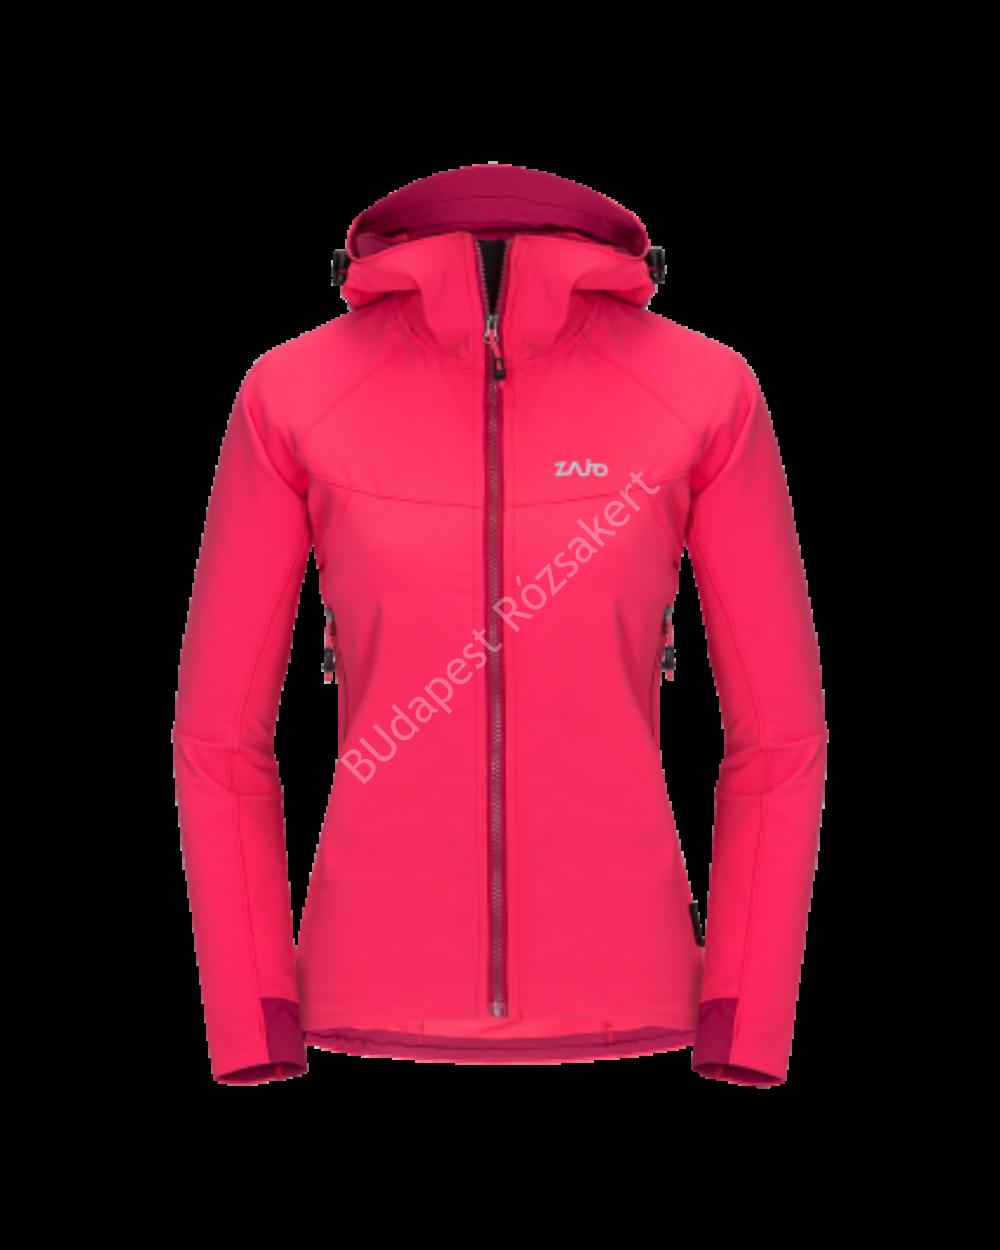 Zajo Air LT Hoody W Jkt  női softshell kabát, teaberry, XL